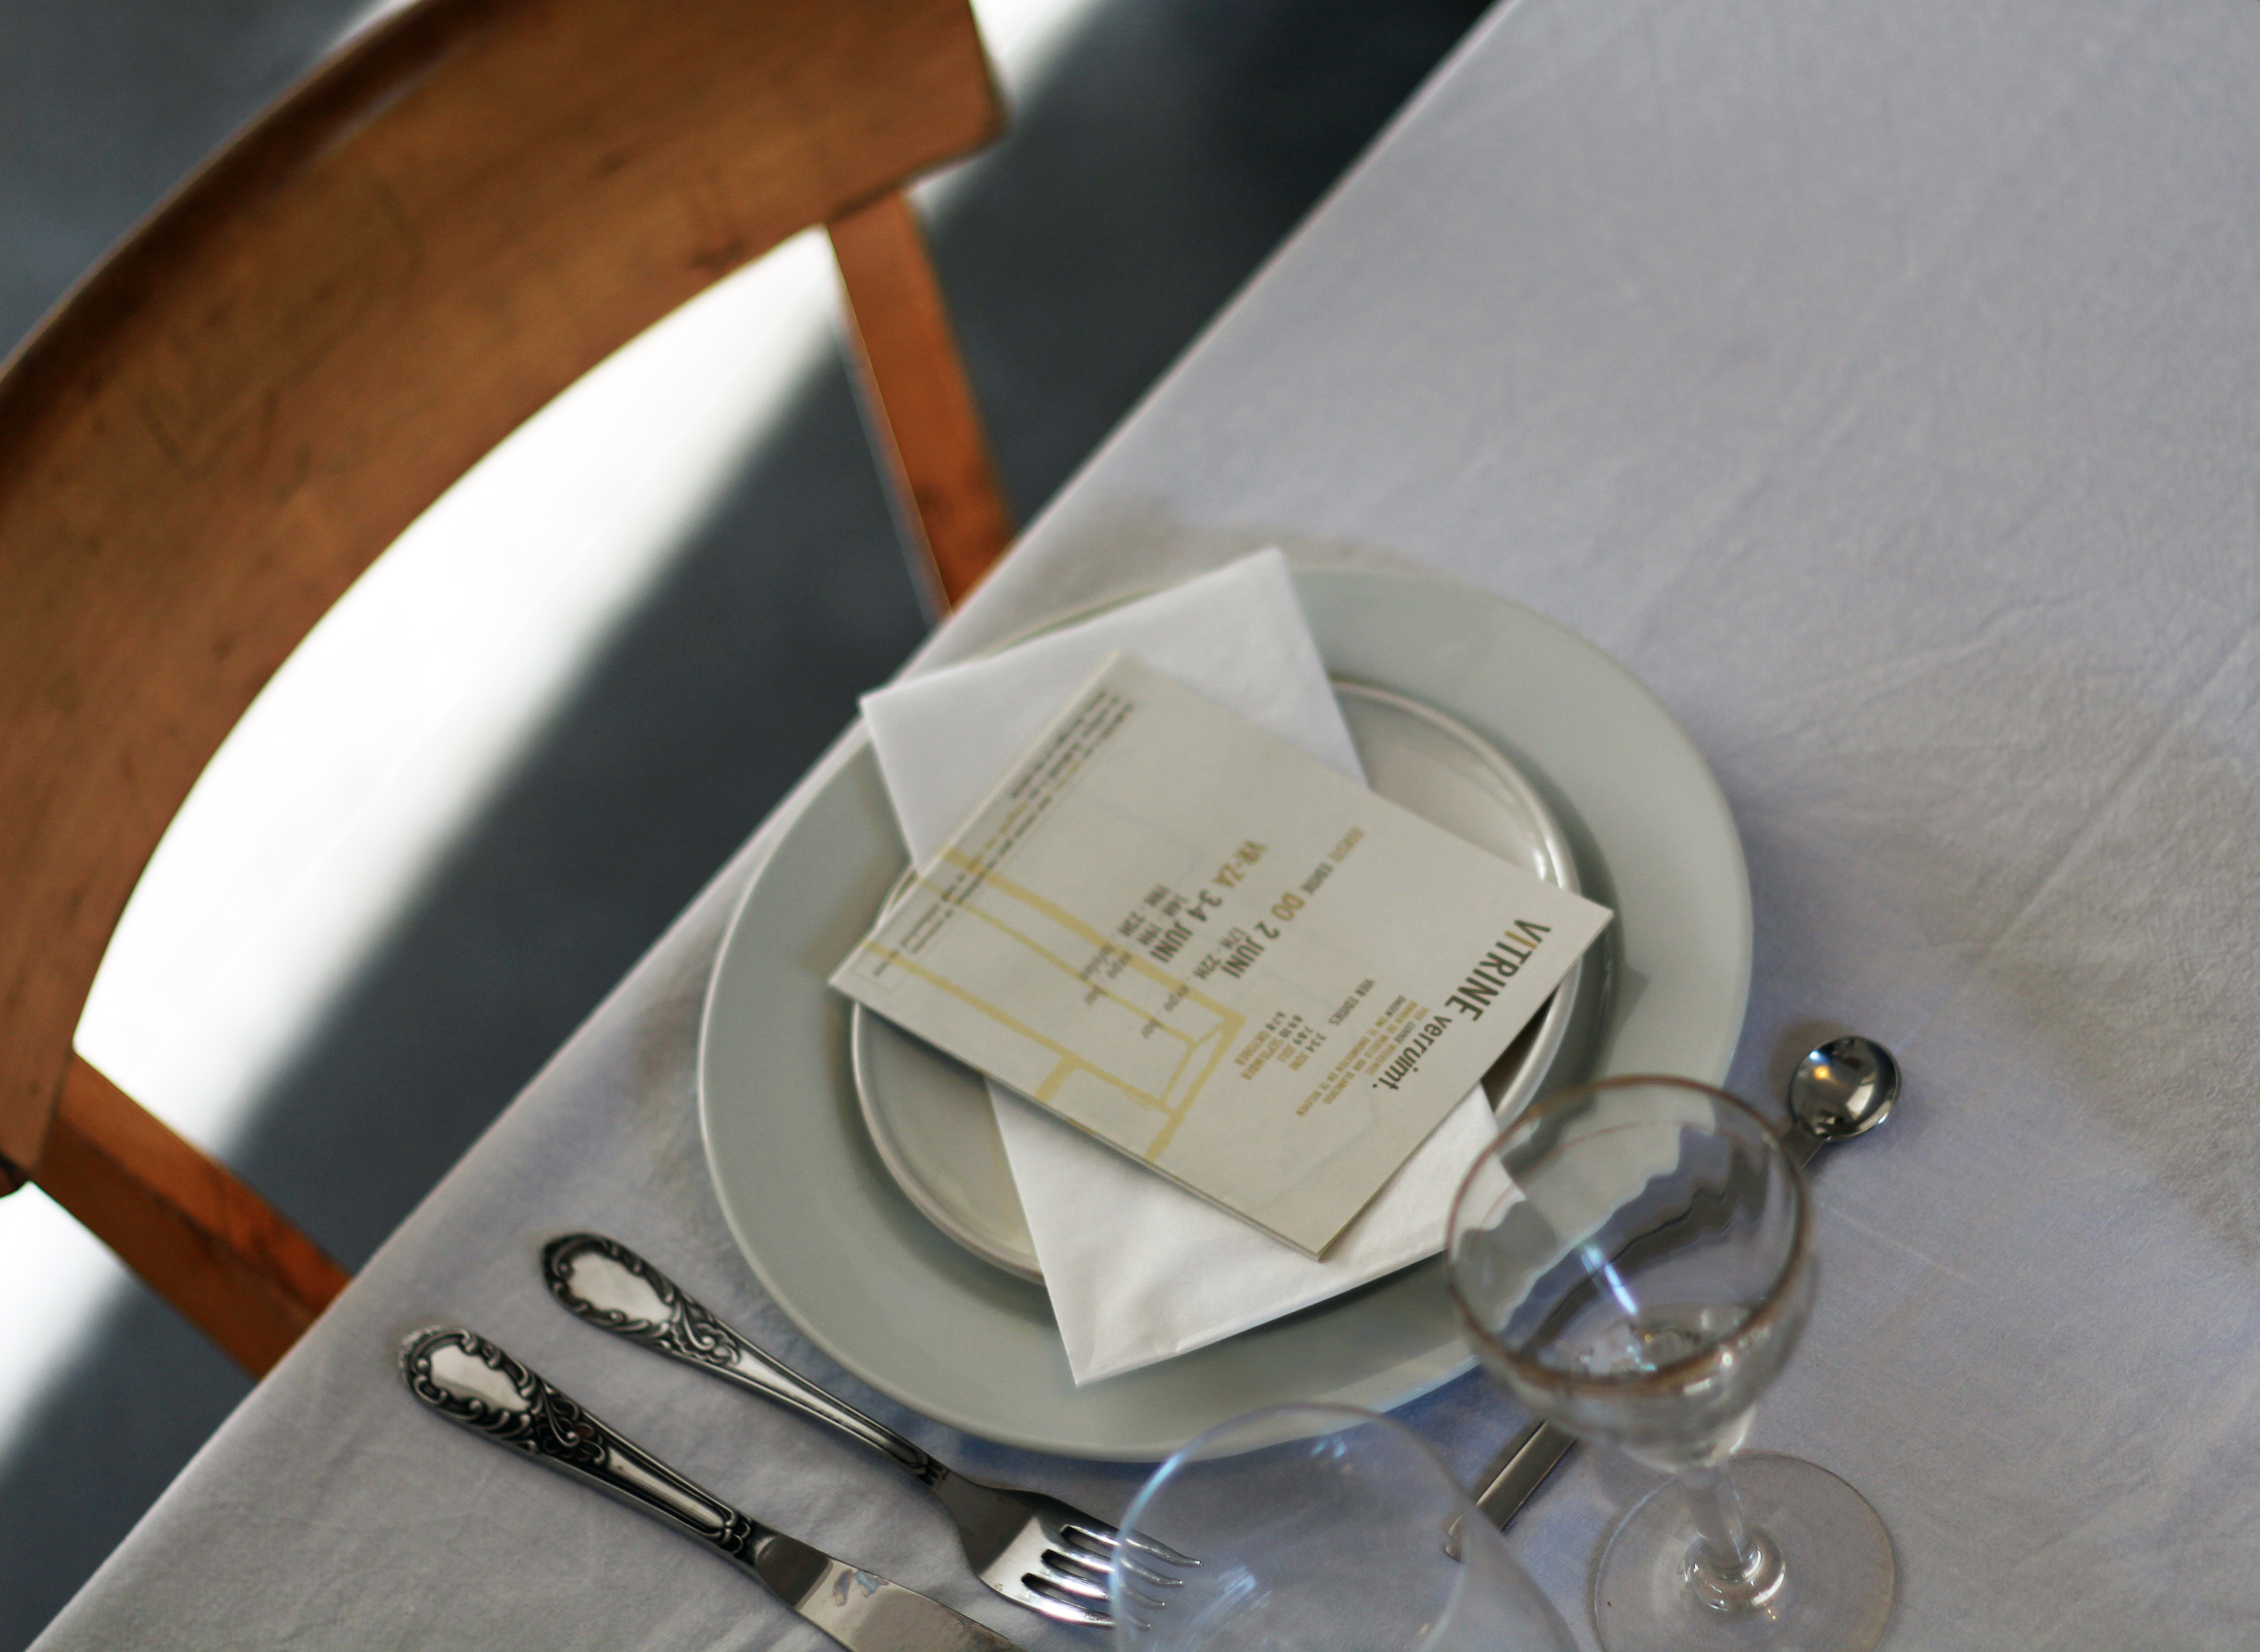 tafels09.jpg